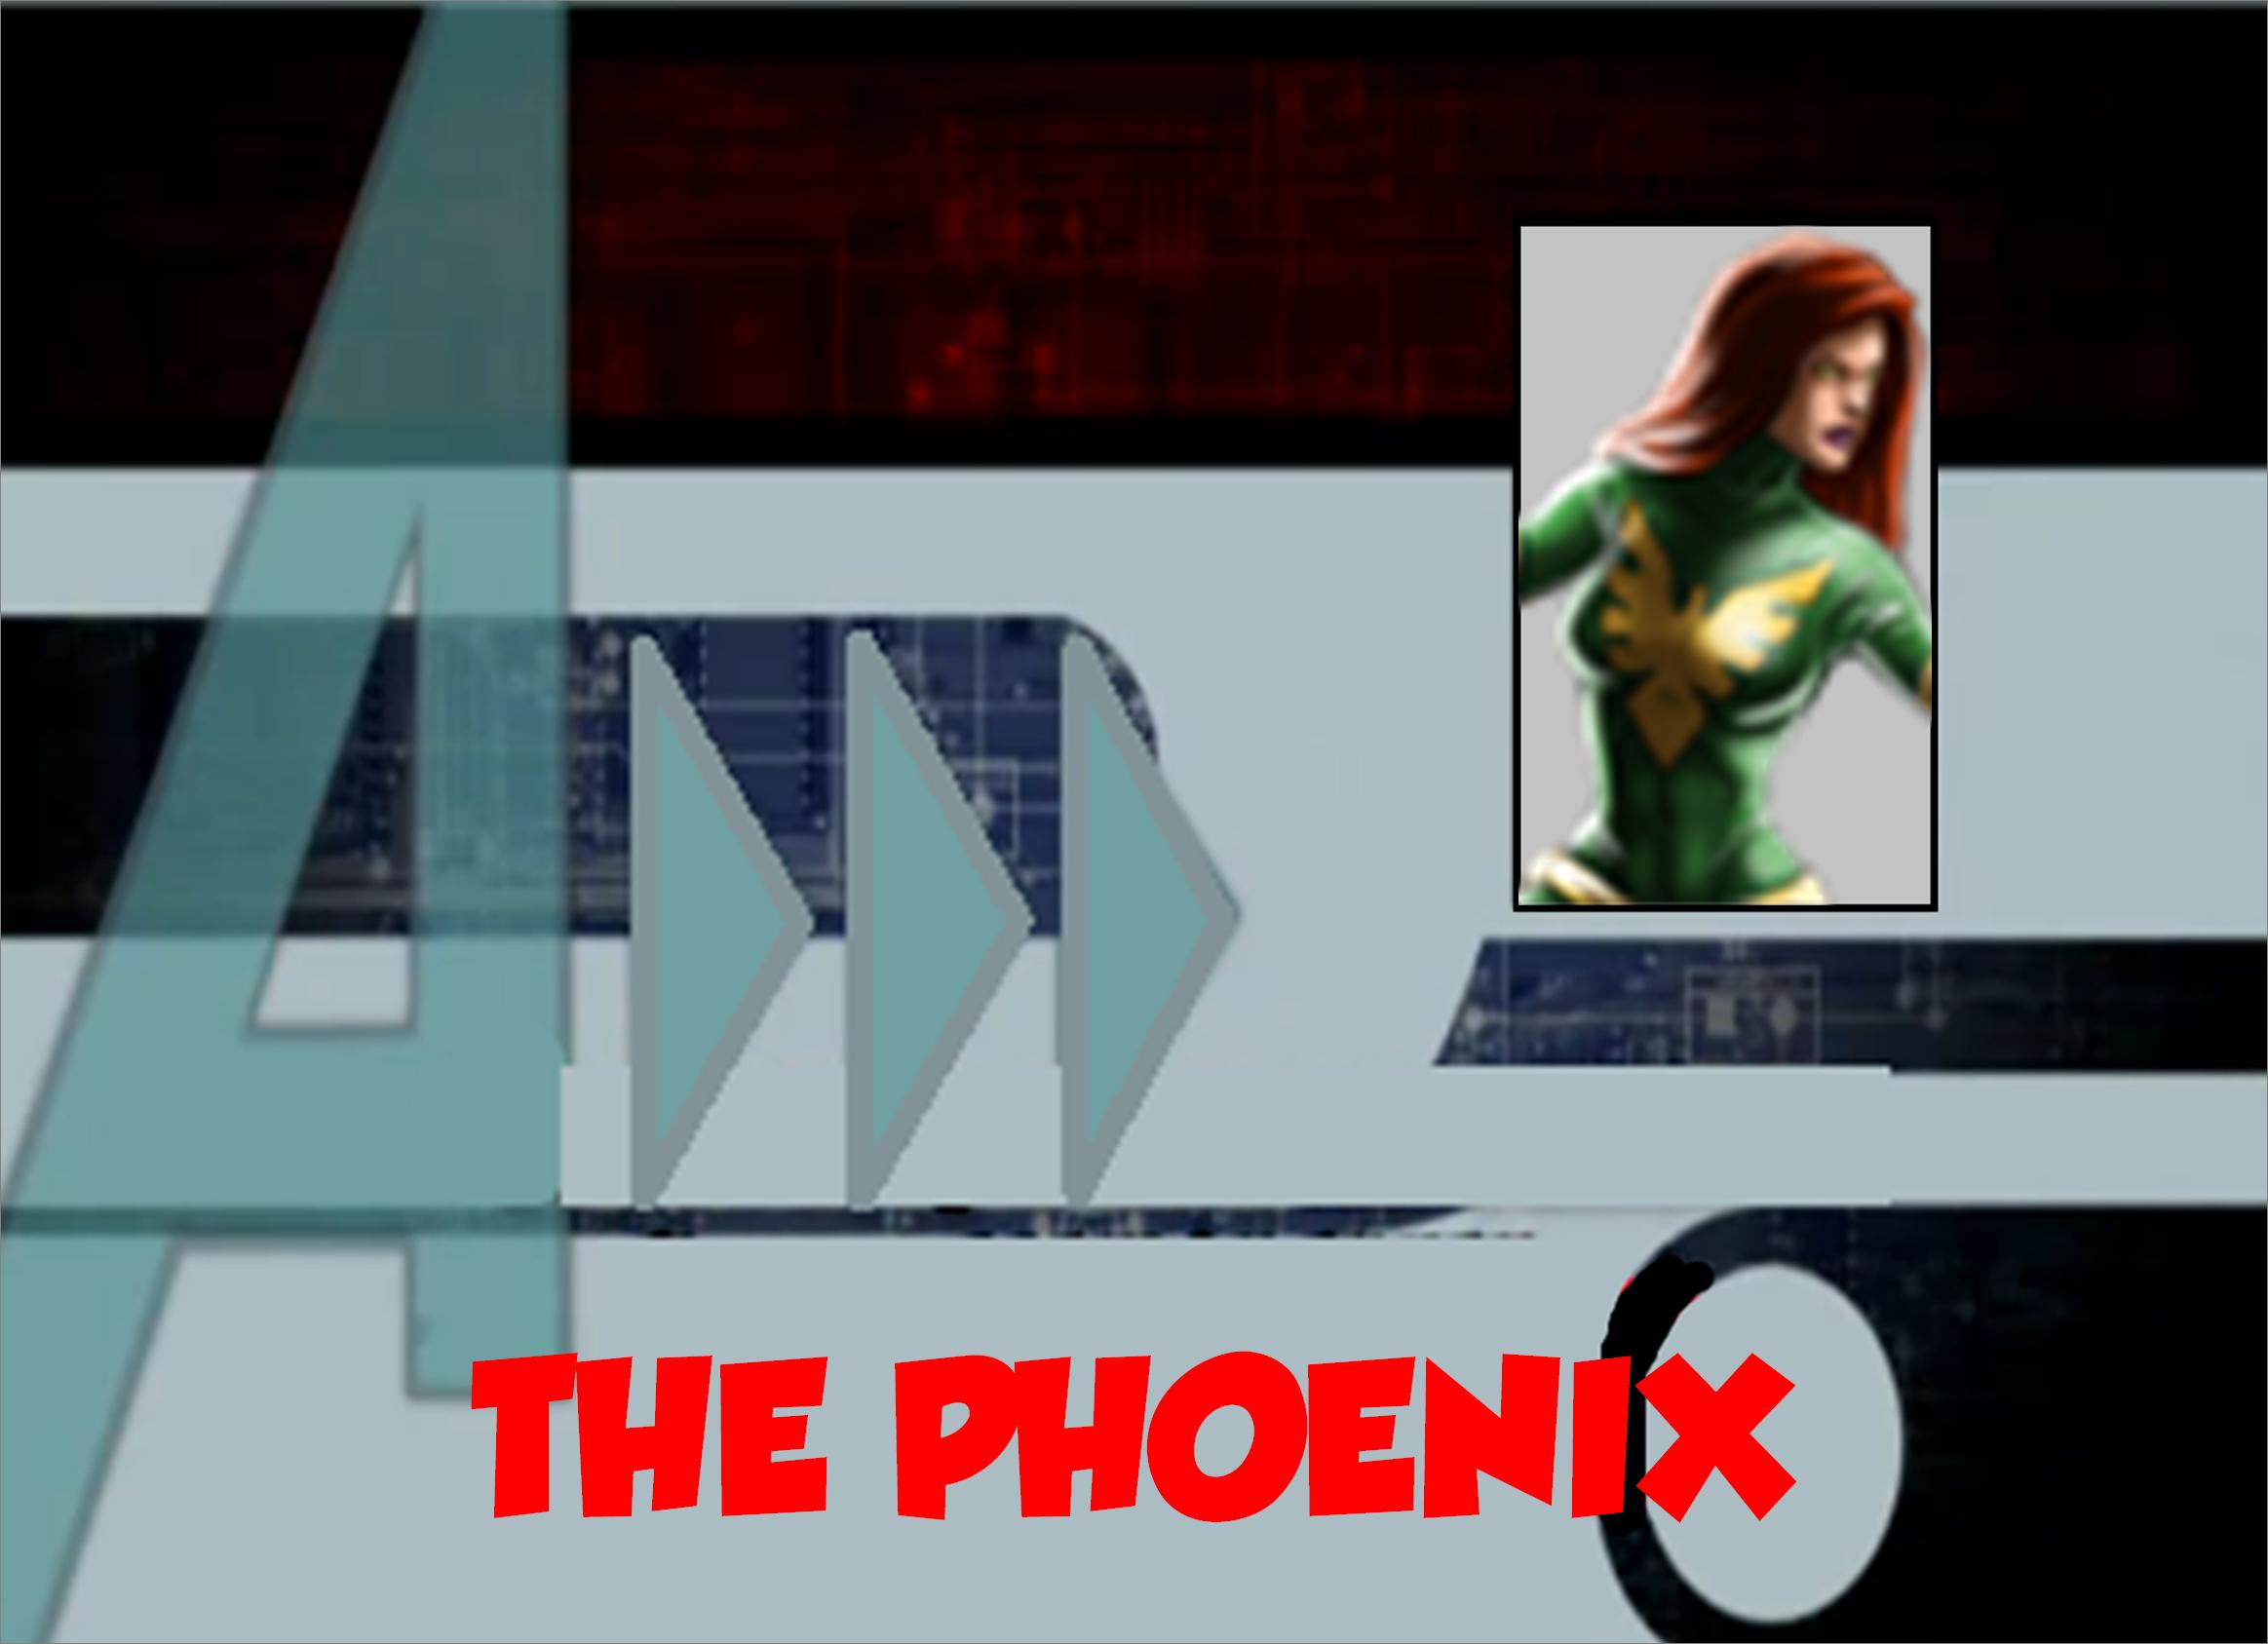 The Phoenix (A!)